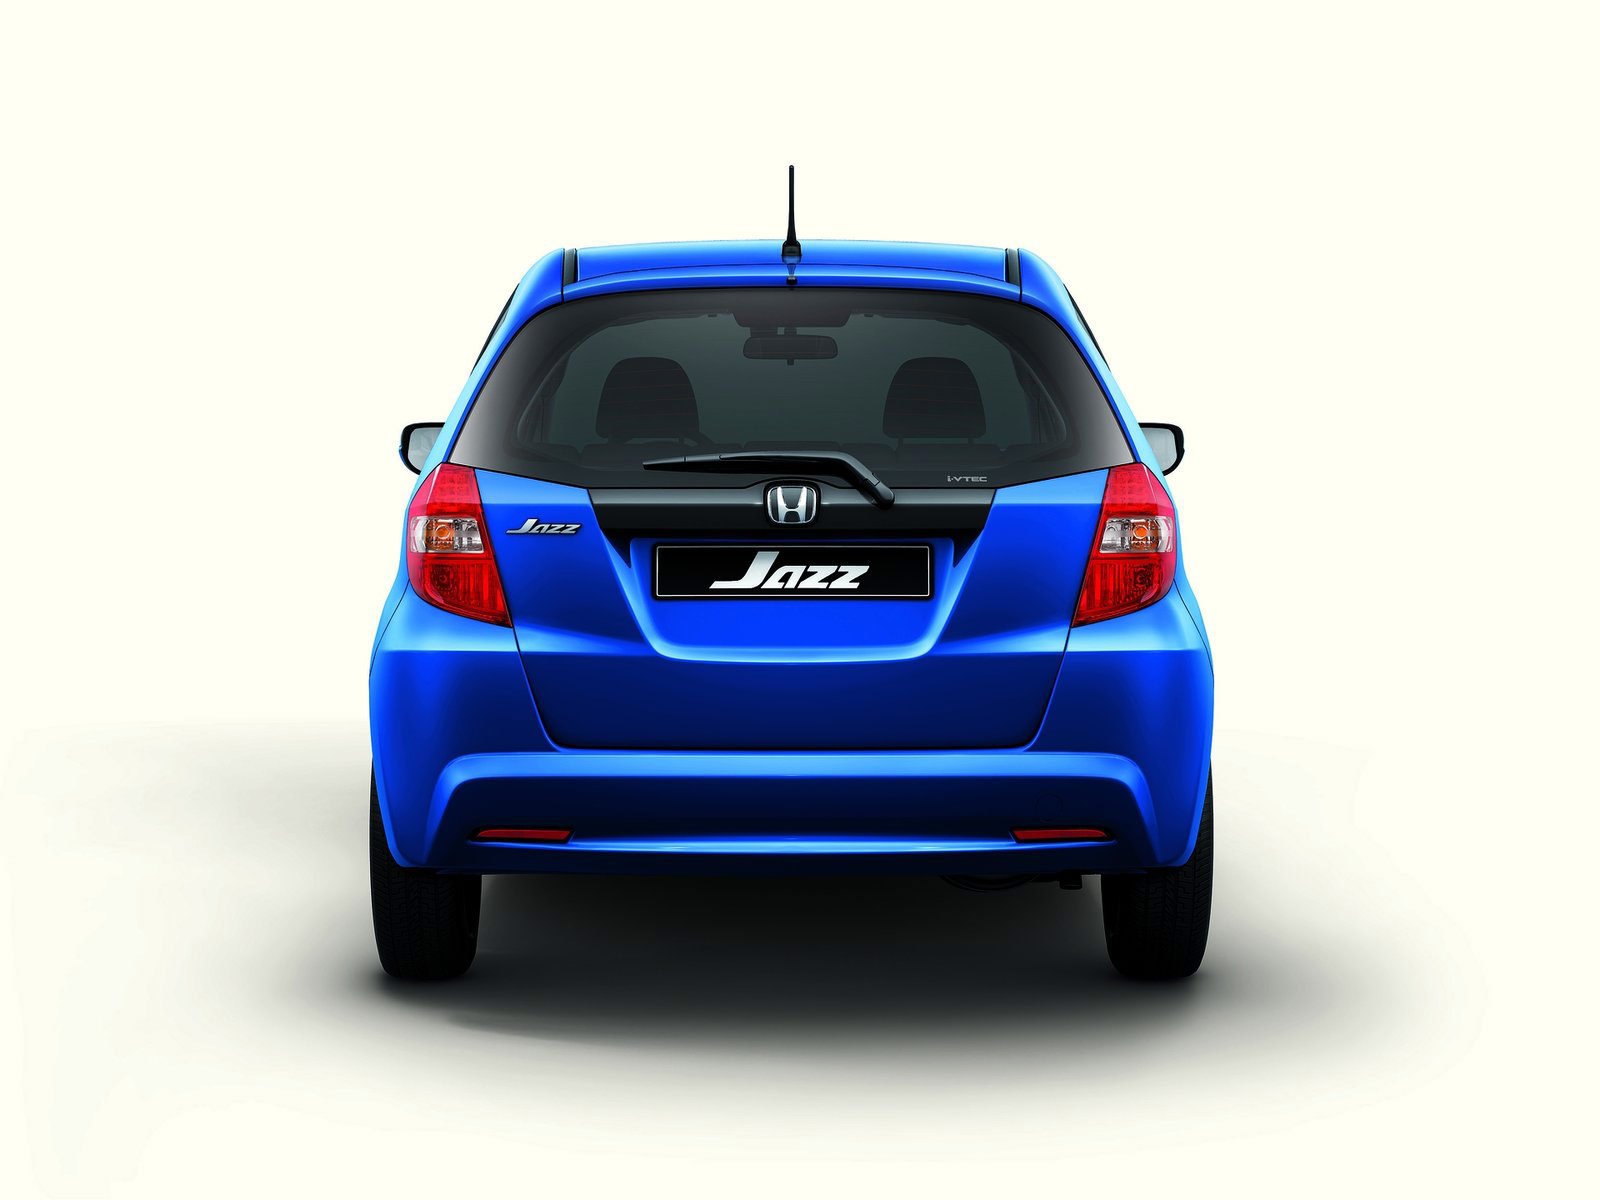 Honda Accord Sedan >> HONDA Jazz 2011 Japanese car photos   Accident lawyers info.